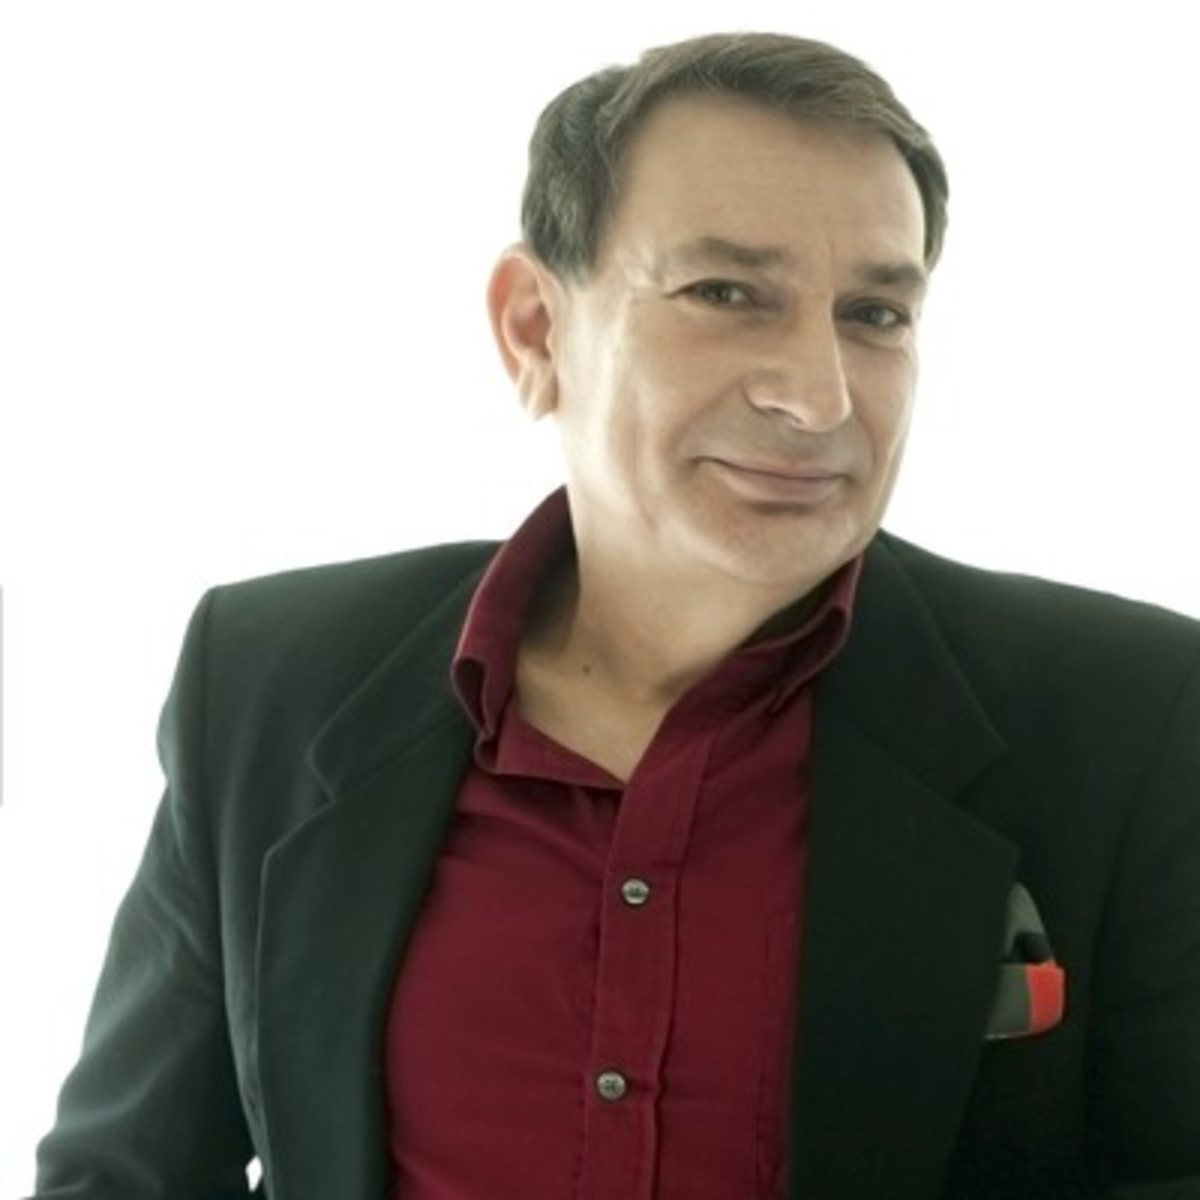 Bill Kelly - WMC Co-Founder